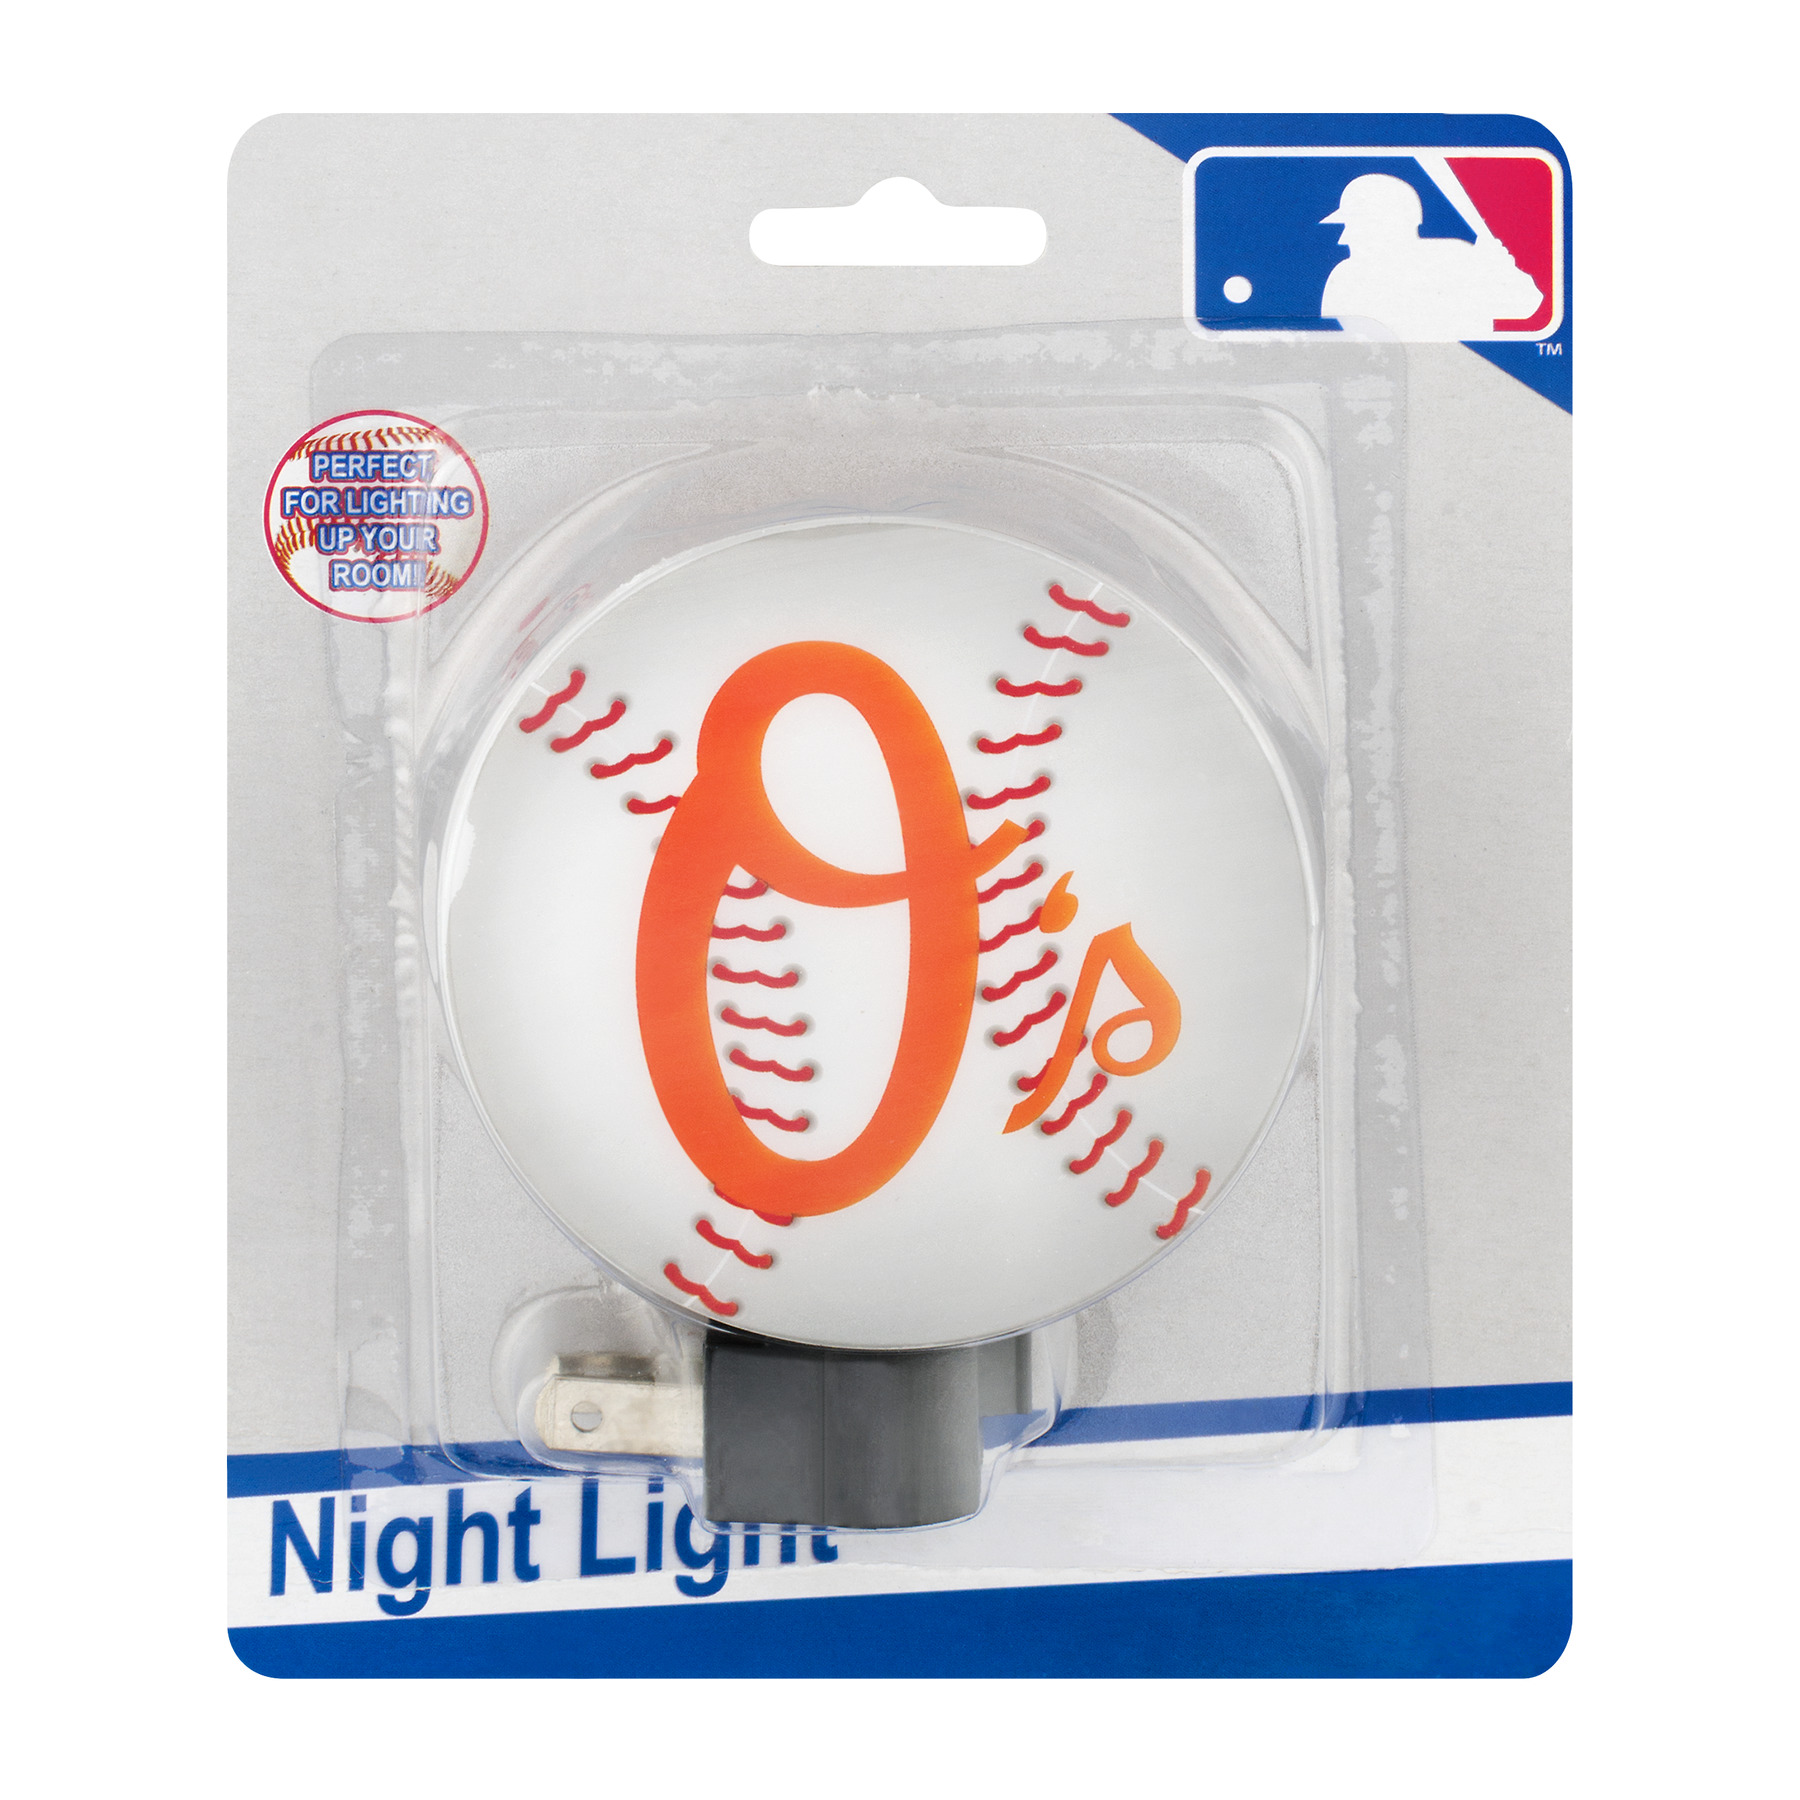 MLB Night Light Baltimore Orioles, 1.0 CT